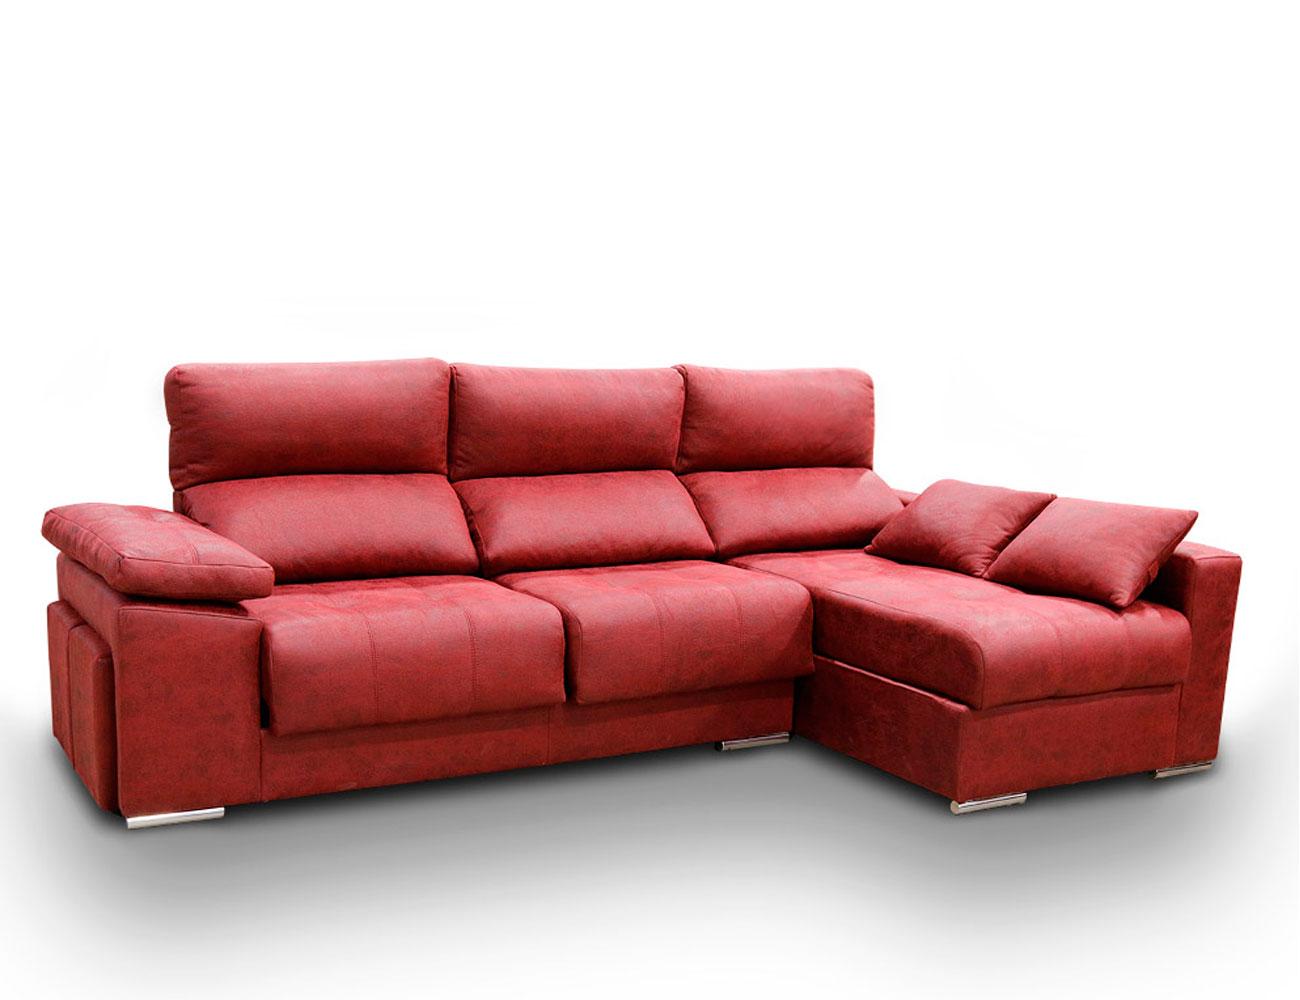 Sofa chaiselongue anti manchas rojo granate3